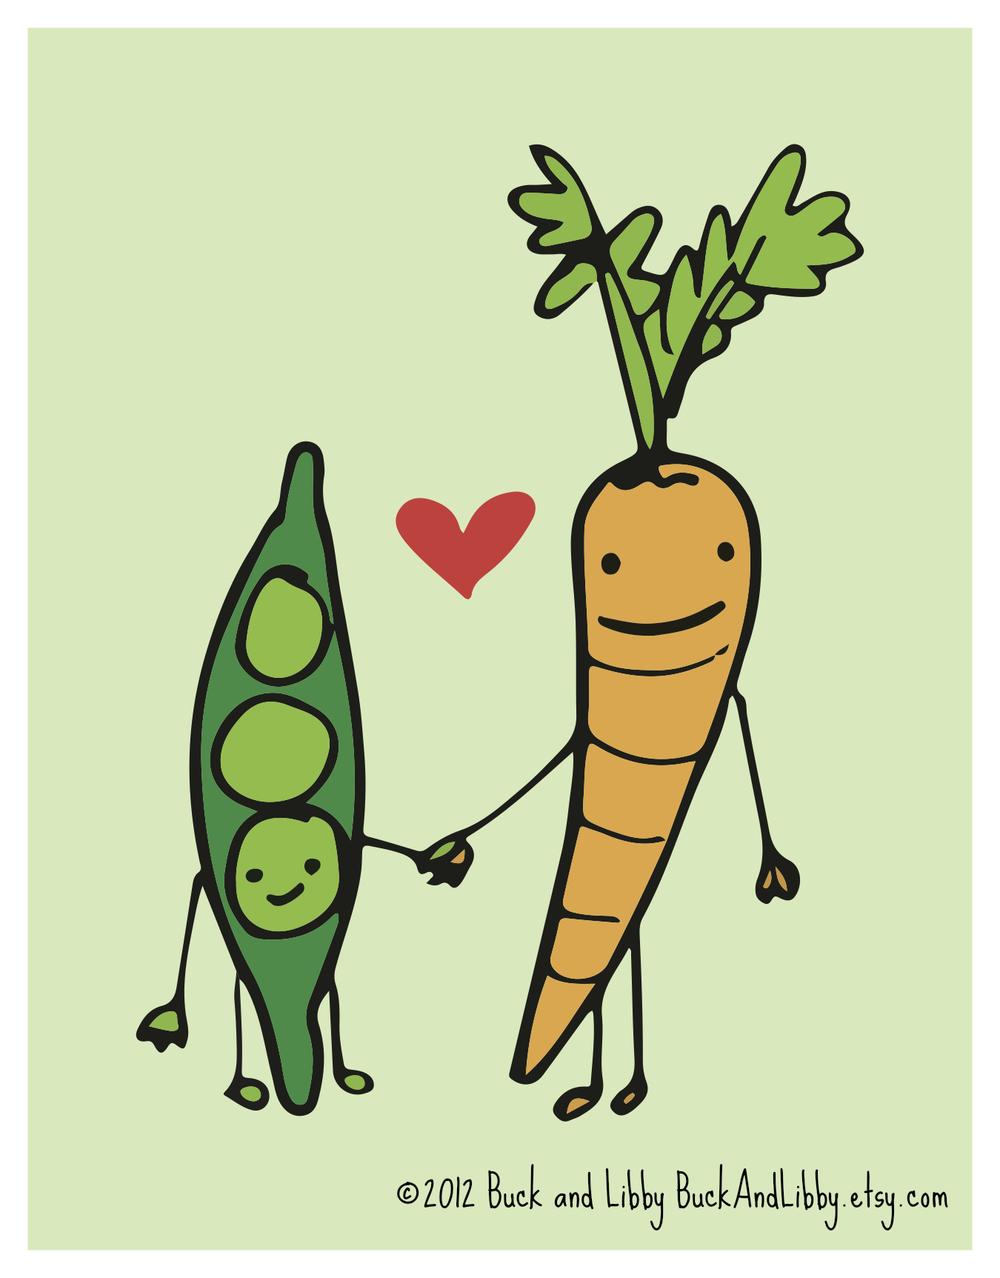 peas_carrots_full_page_etsy.jpg